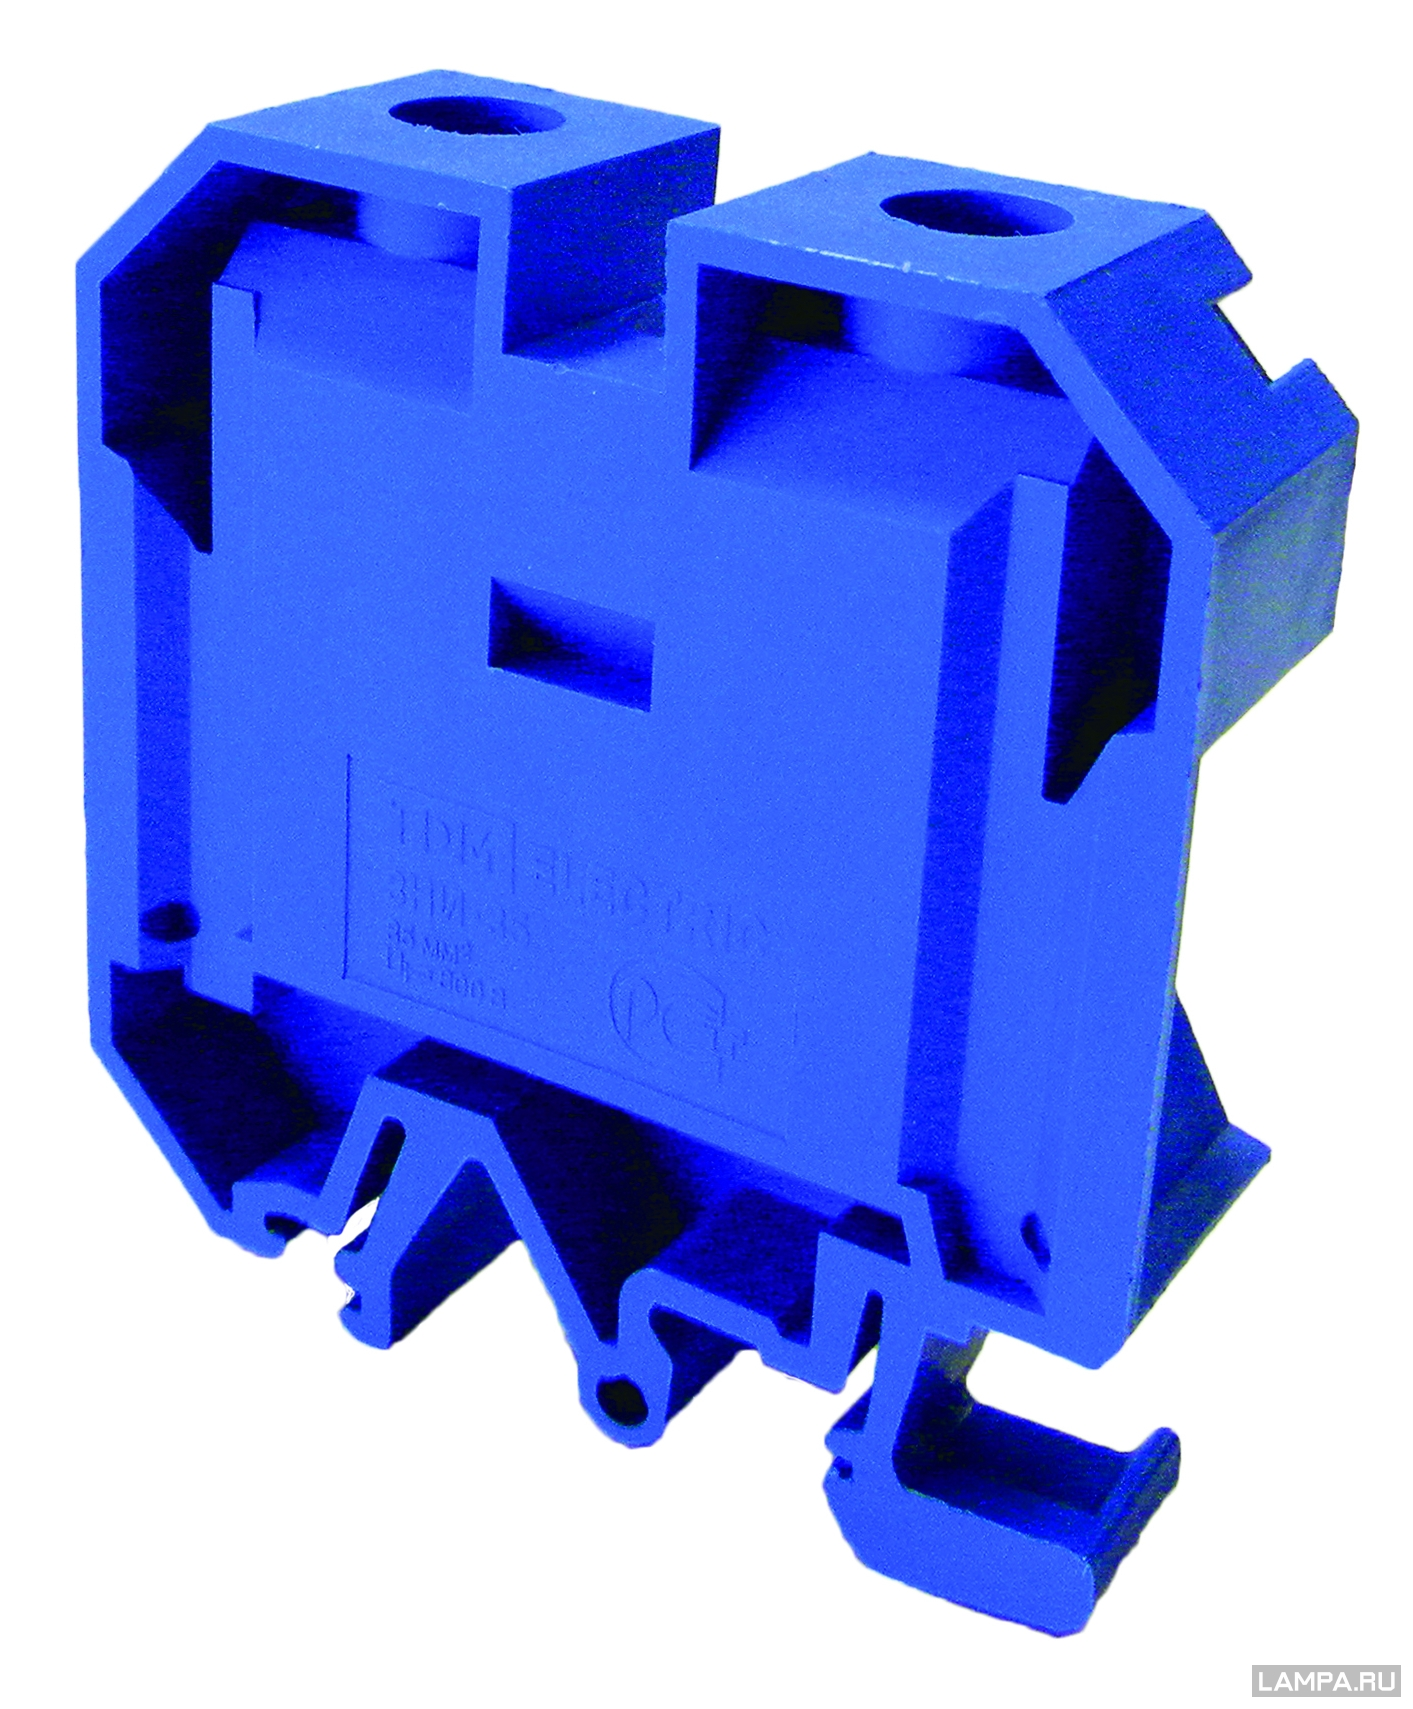 Зажим наборный Tdm Sq0803-0006 изолятор tdm sq0810 0006